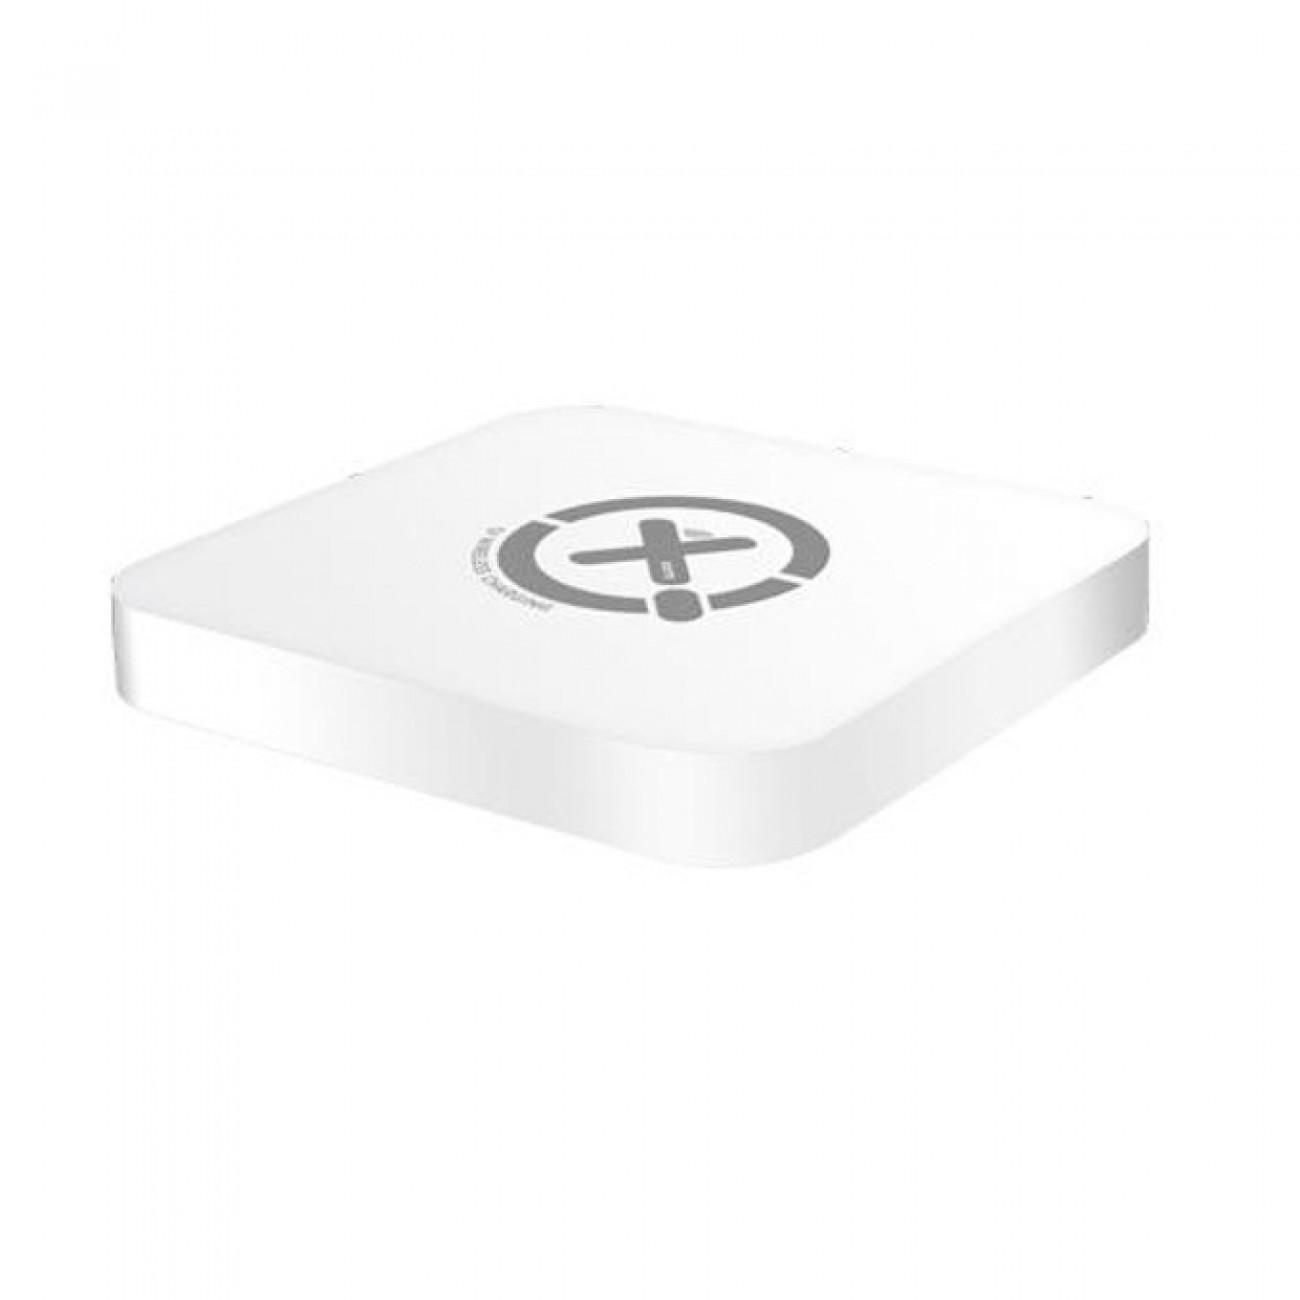 Безжично зарядно устройство A-solar Xtorm BU108, от 5V/1.5A към 5V/0.5-1A, бяло в Зарядни устройства за батерии - A-Solar | Alleop